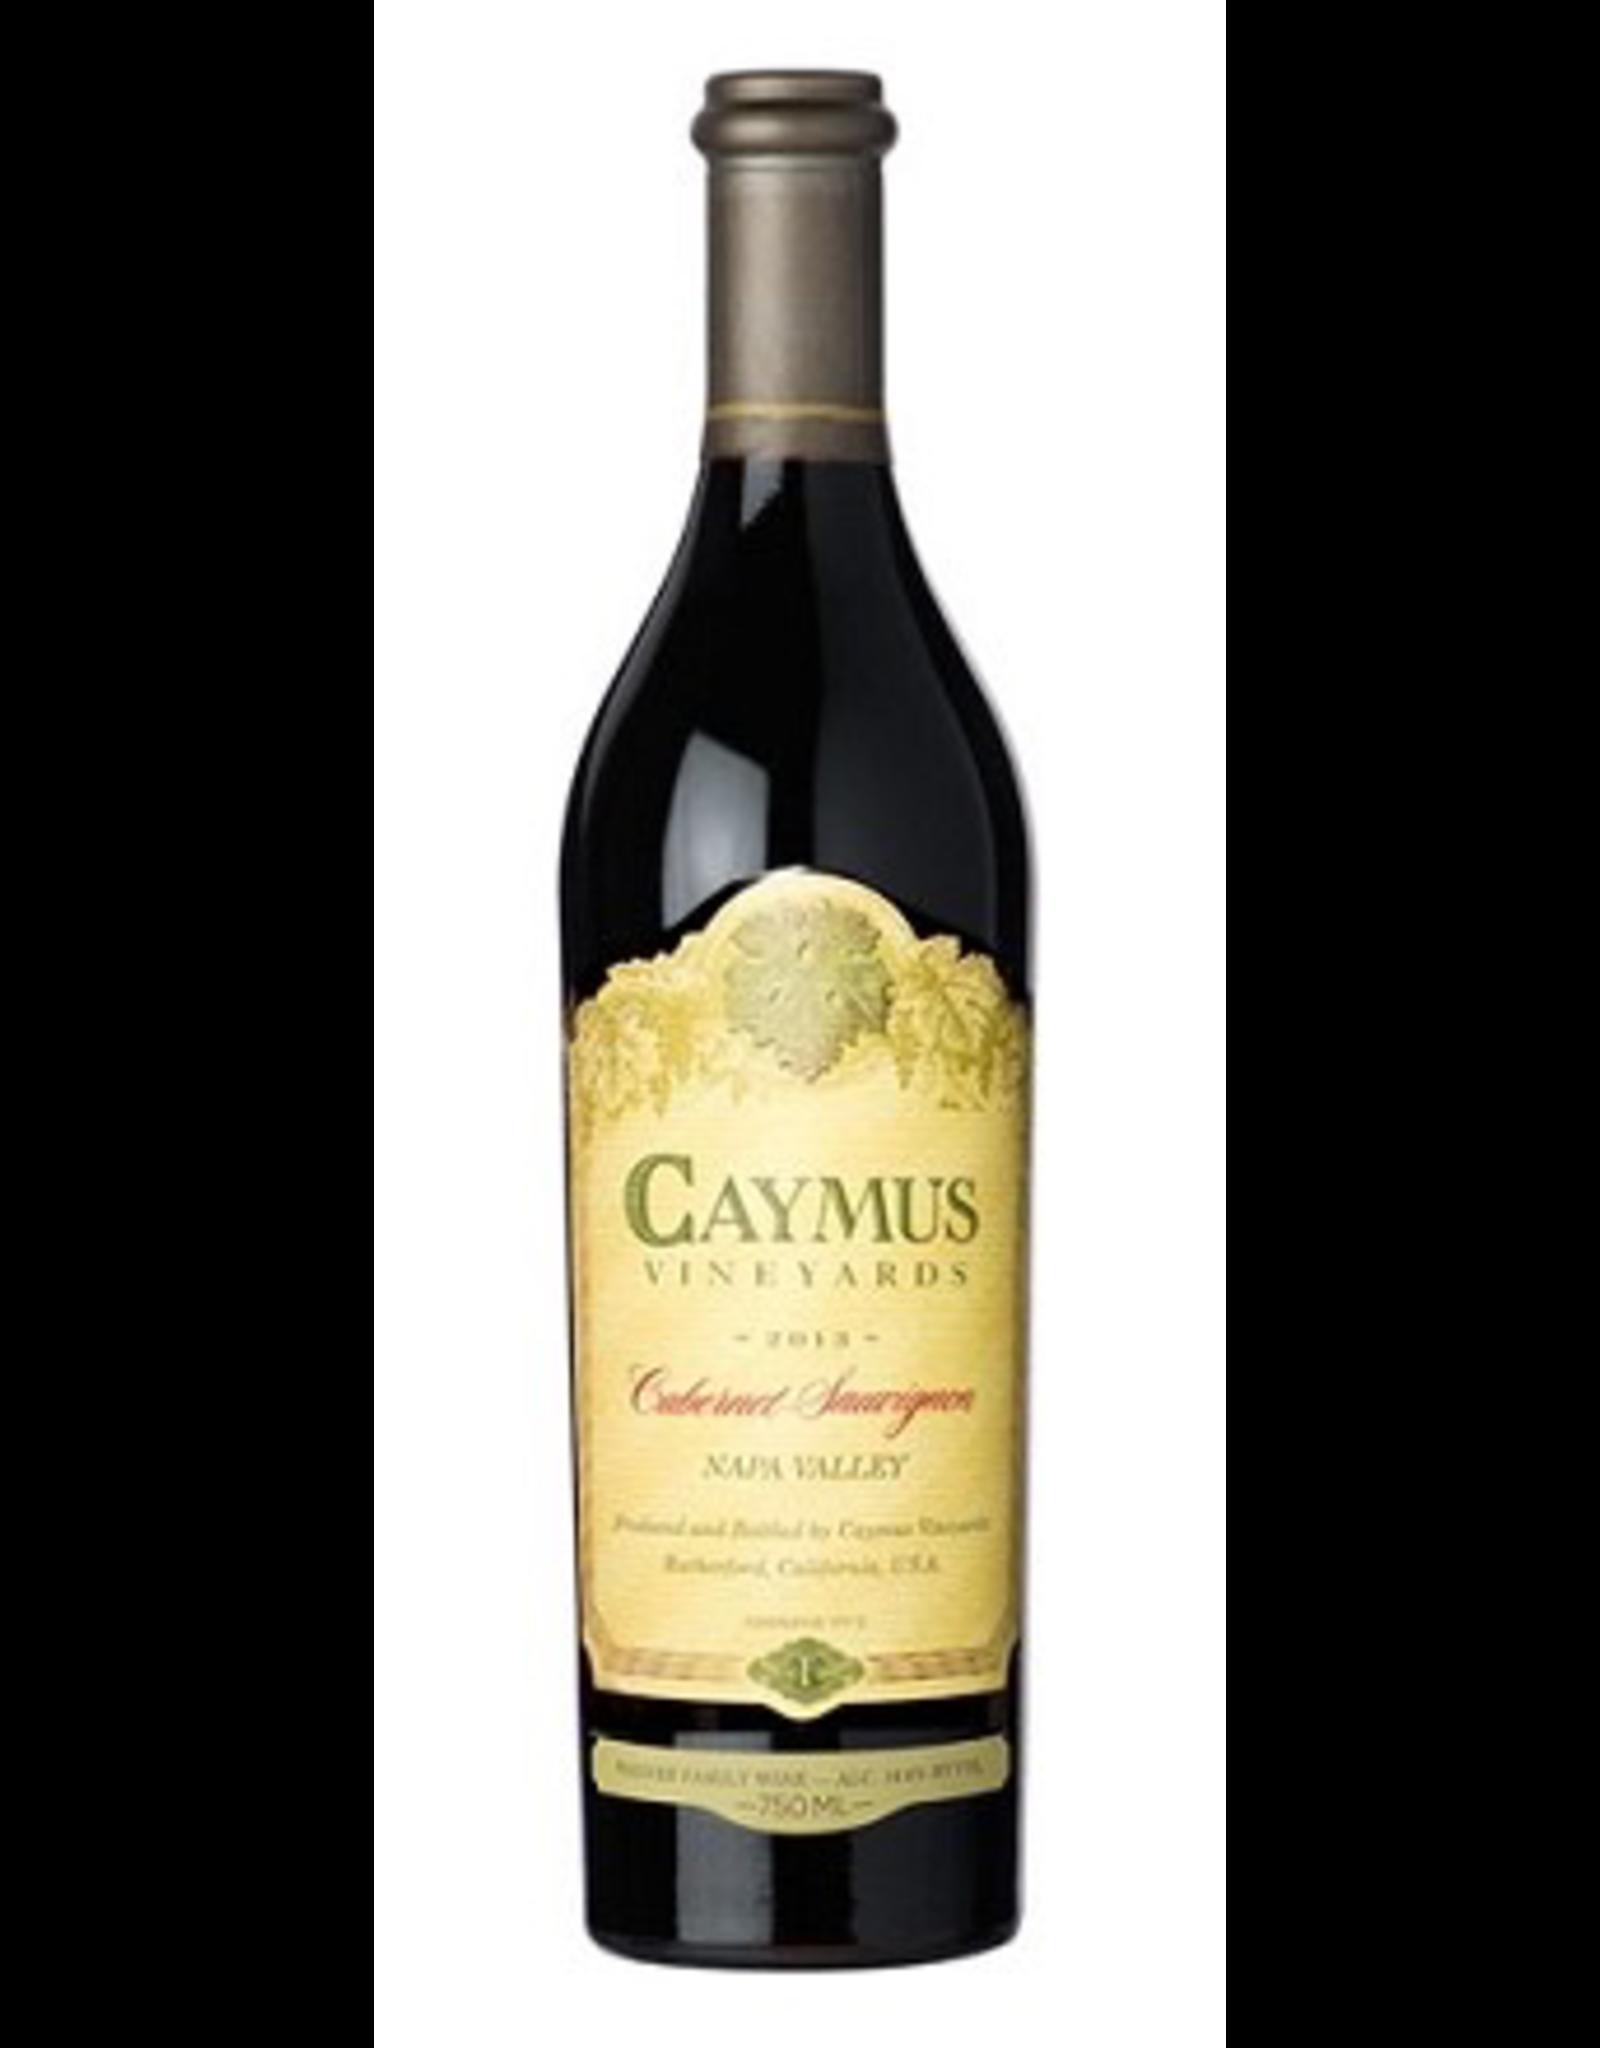 Red Wine 2018, Caymus Vineyards 750ml, Cabernet Sauvignon, Napa, Napa Valley, California, 14.6% Alc, CT90